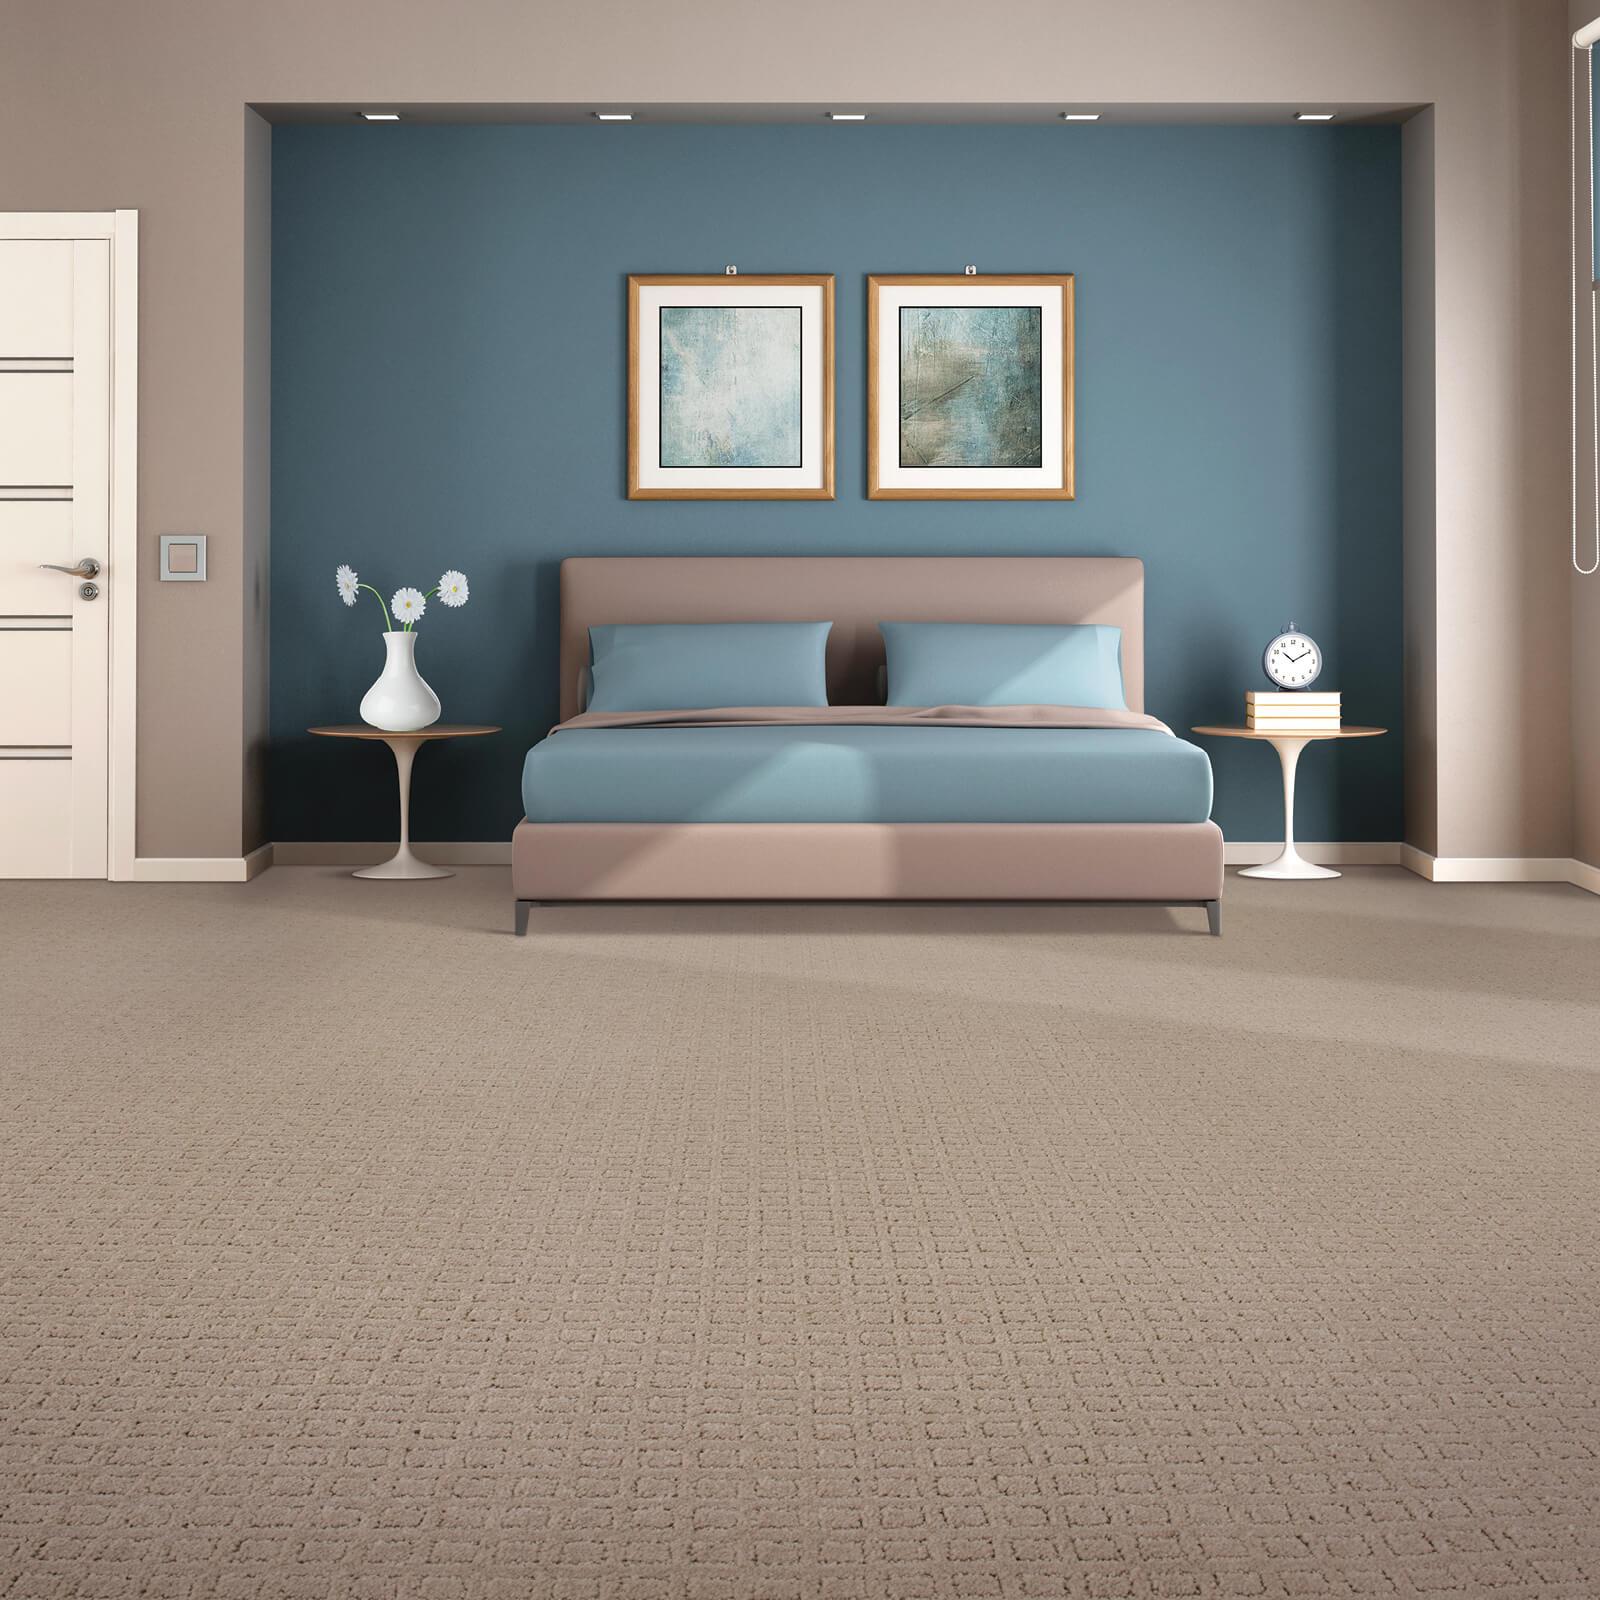 Traditional Beauty of bedroom | J/K Carpet Center, Inc